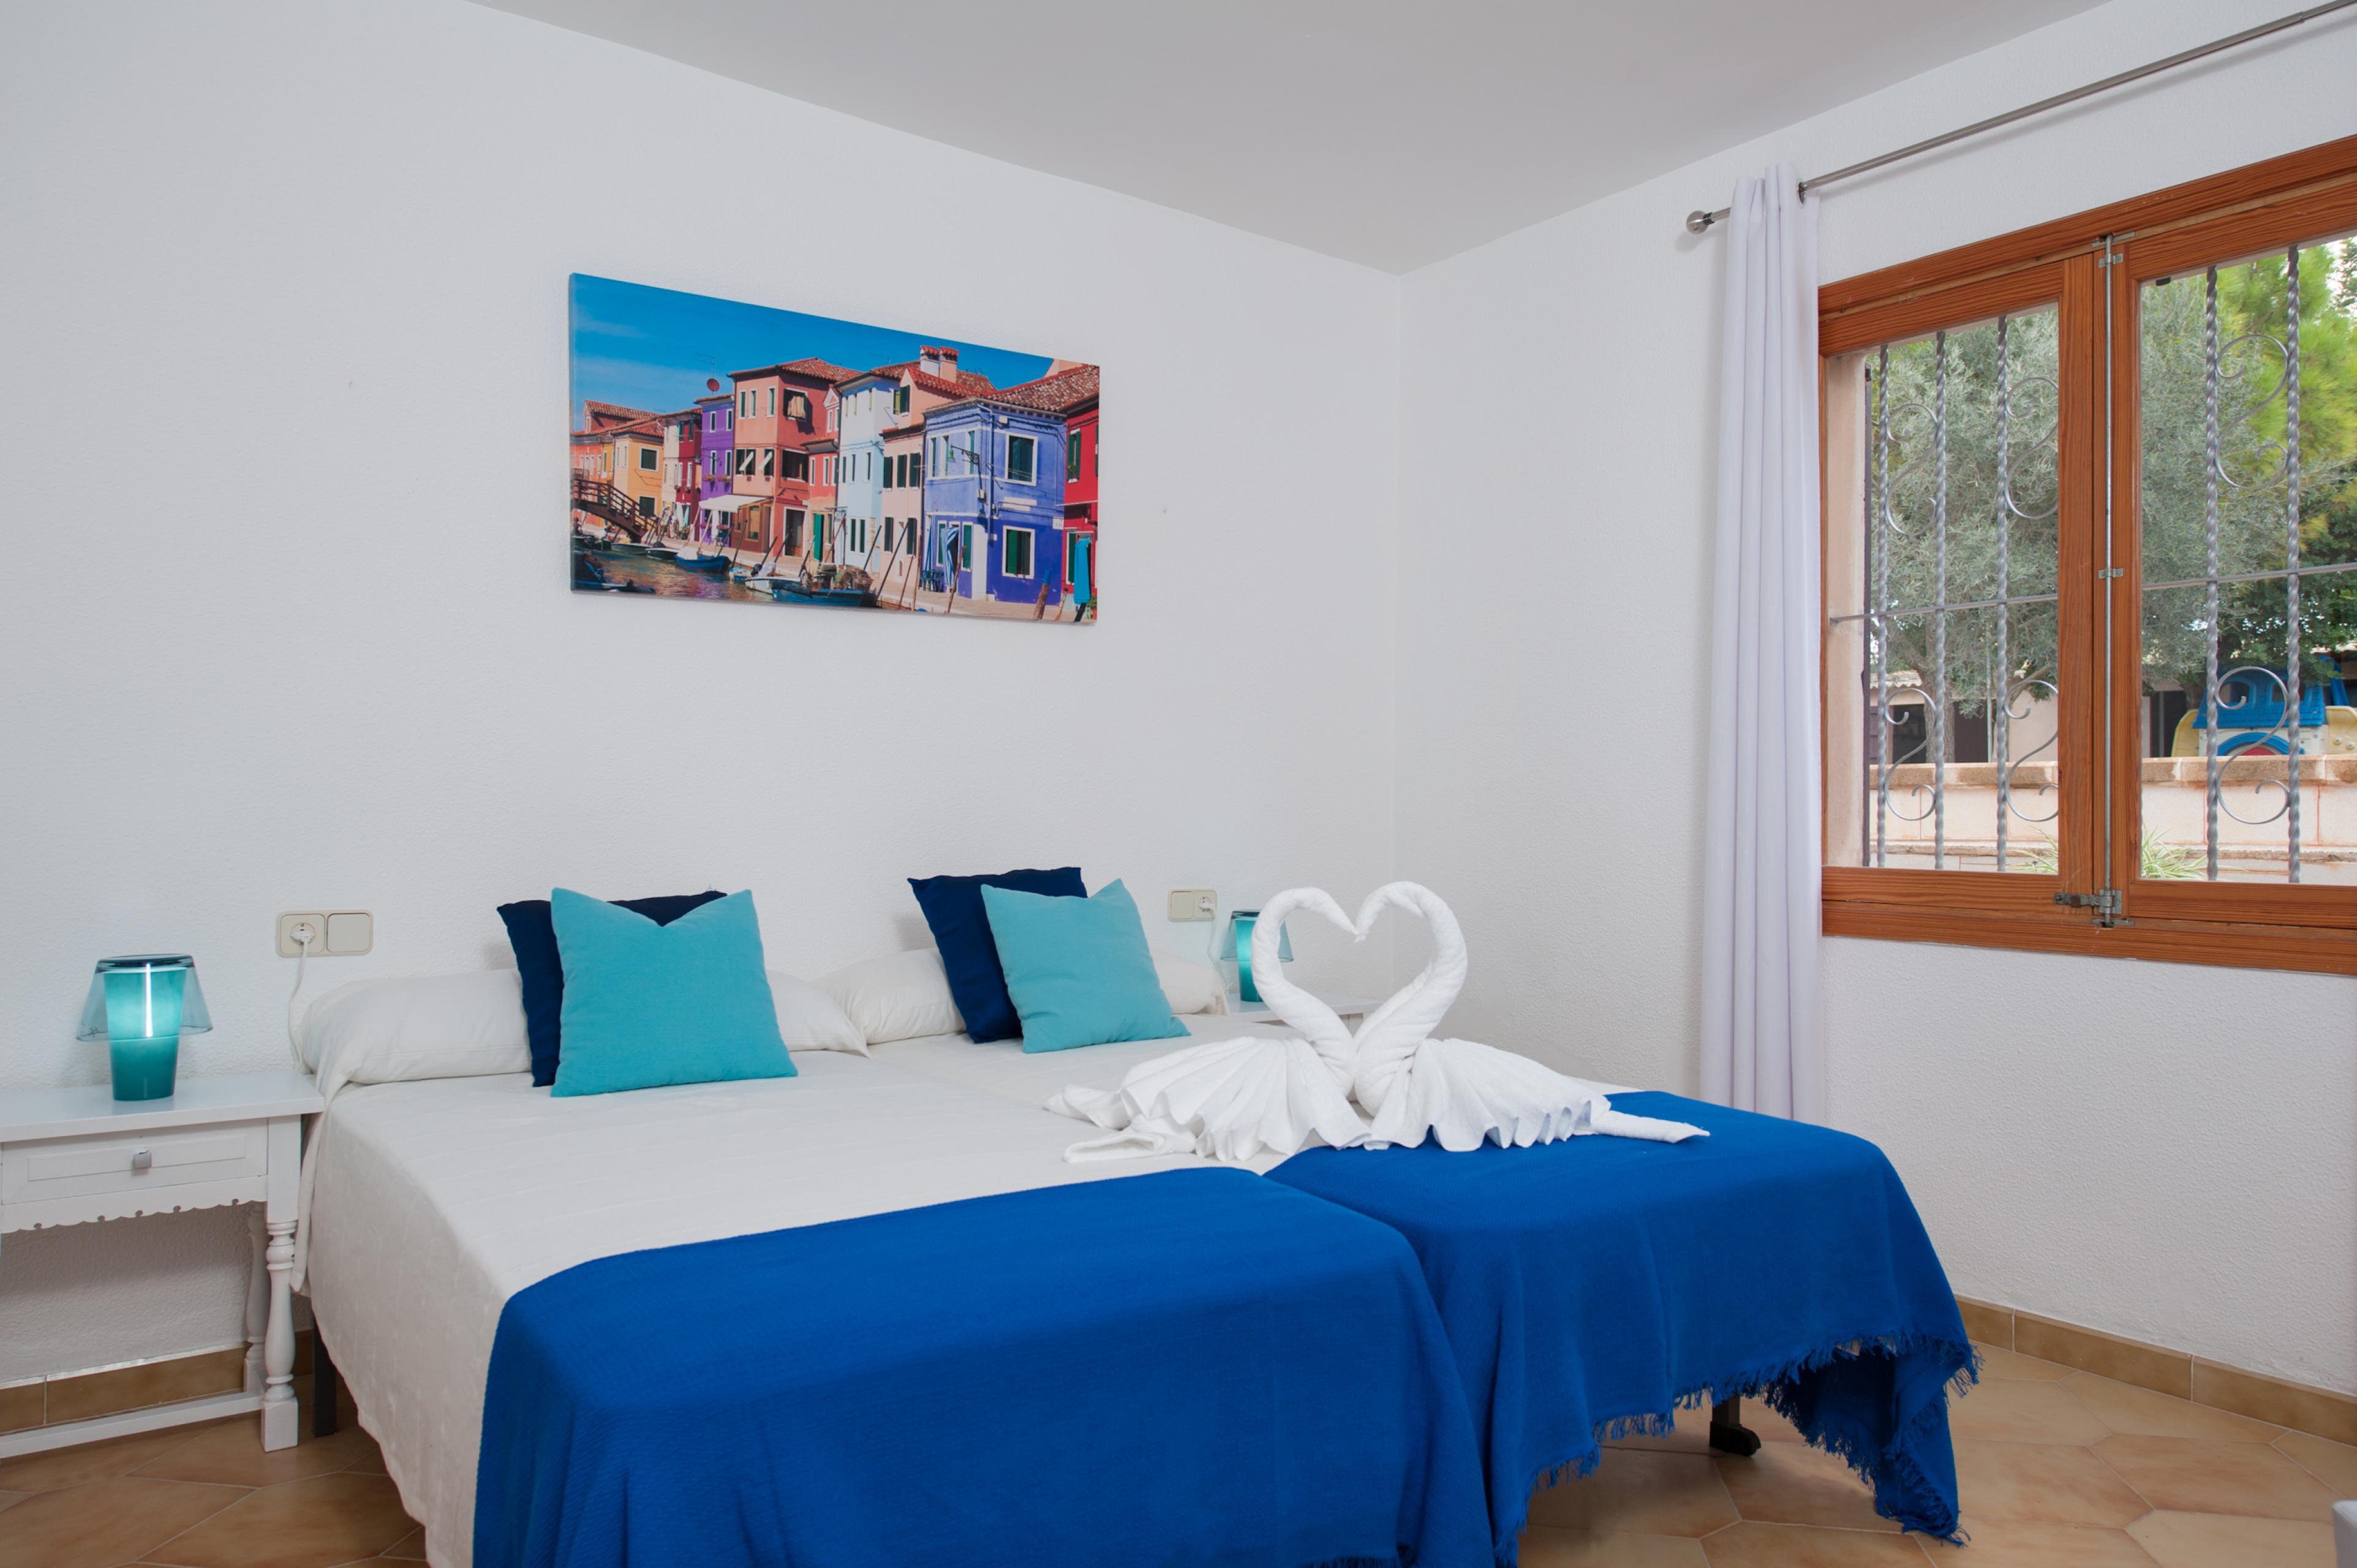 Maison de vacances CA'N LLUC- Alaró- MALLORCA - Kostenloses WLAN (2687507), Alaro, Majorque, Iles Baléares, Espagne, image 22